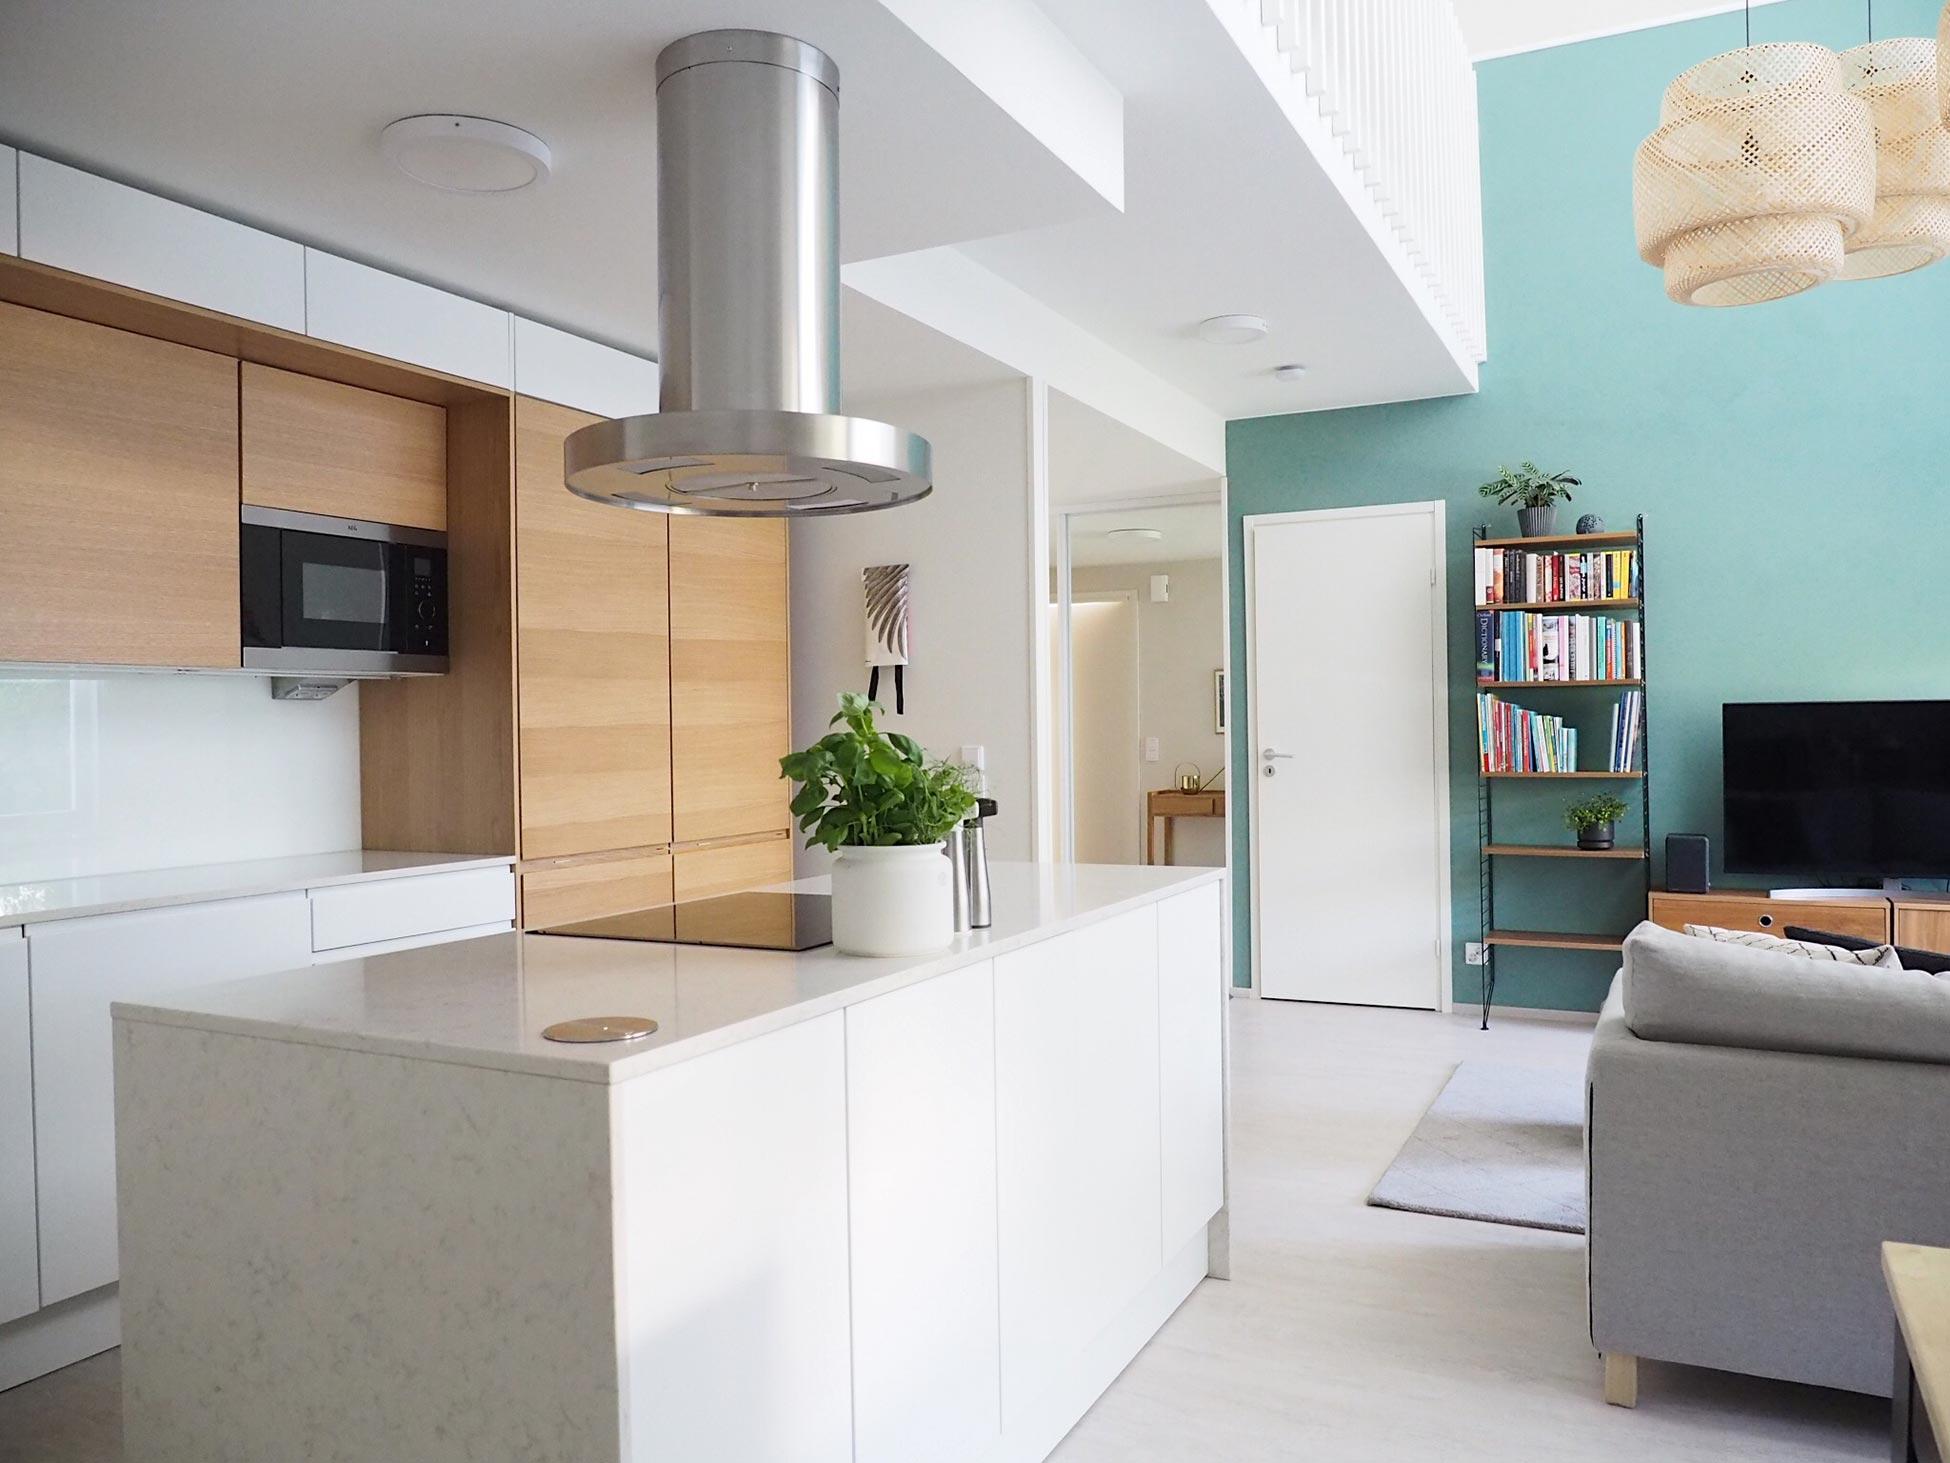 Pilke-Interior värisuunnittelu